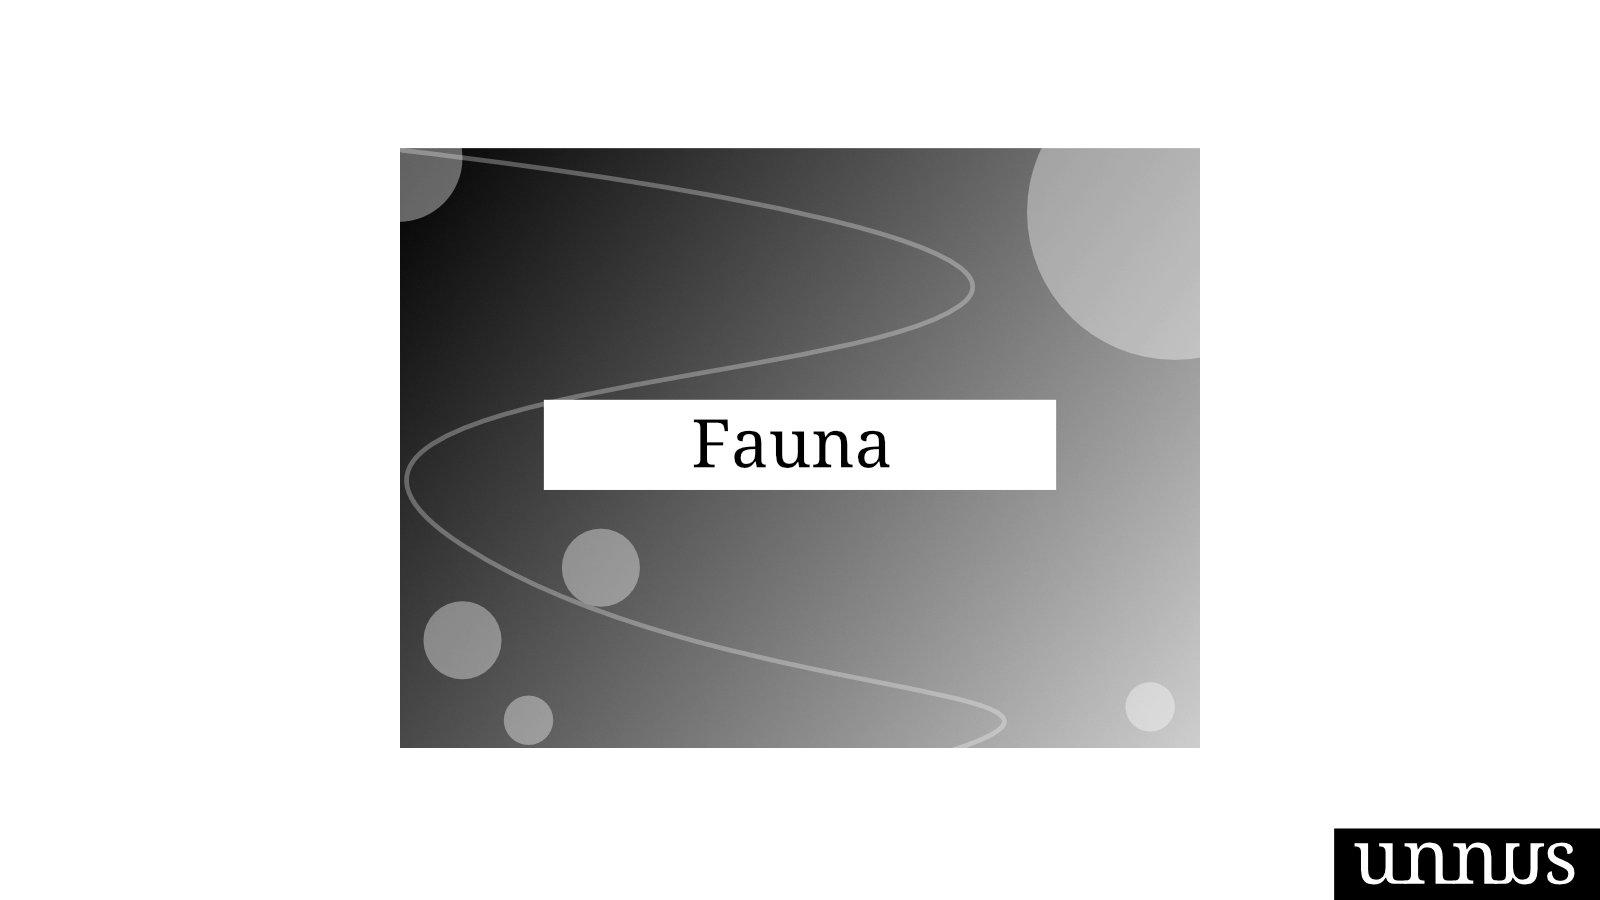 veterinary clinic names examples